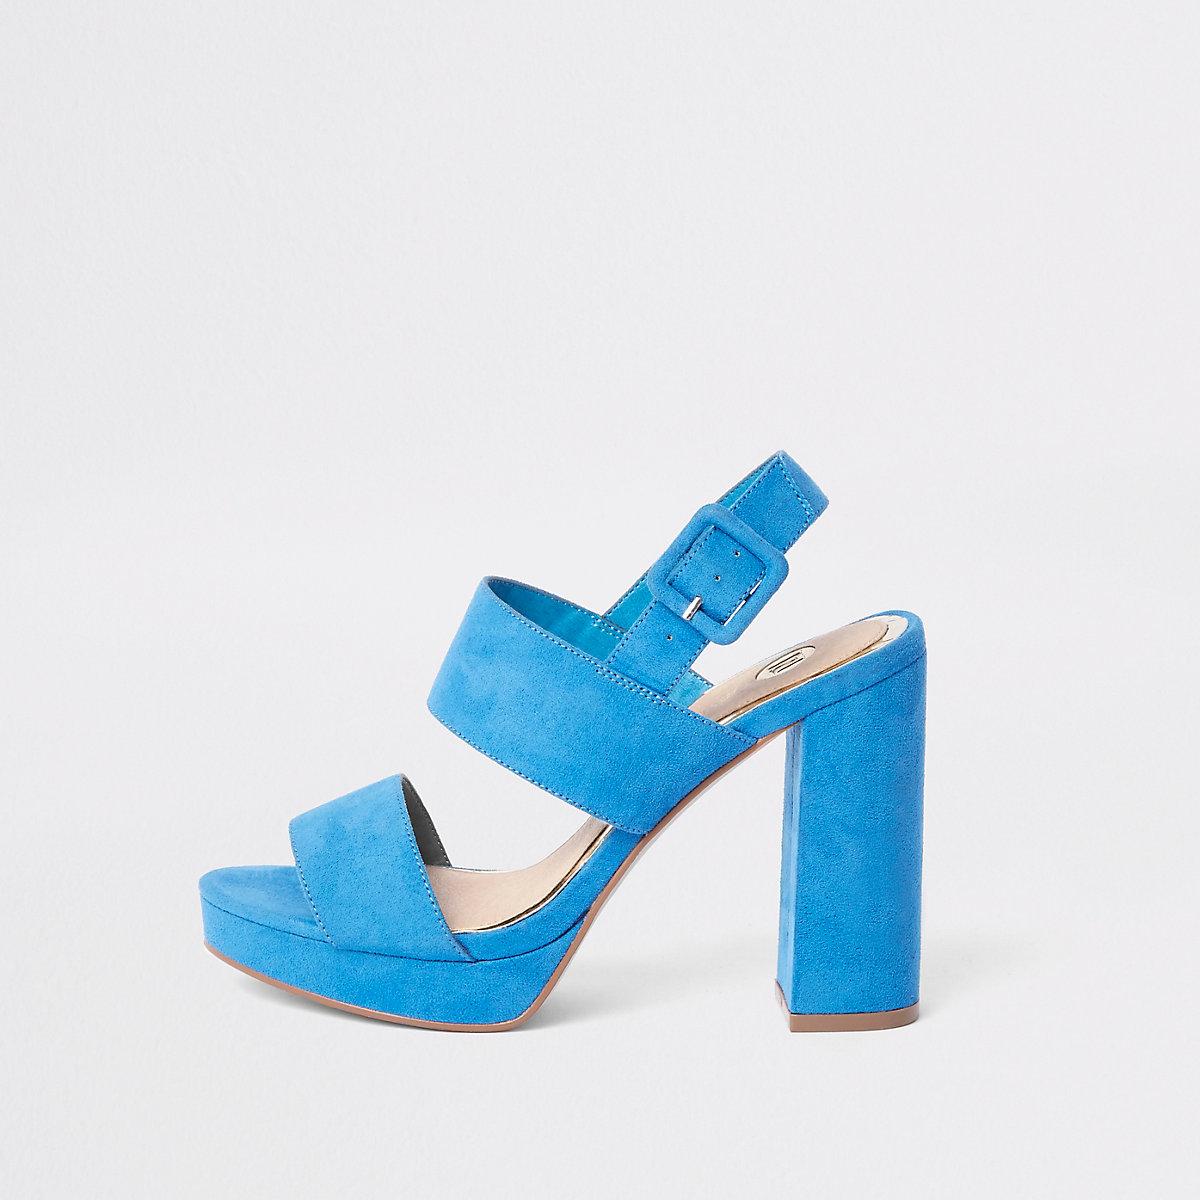 Blue double strap heel platform sandals